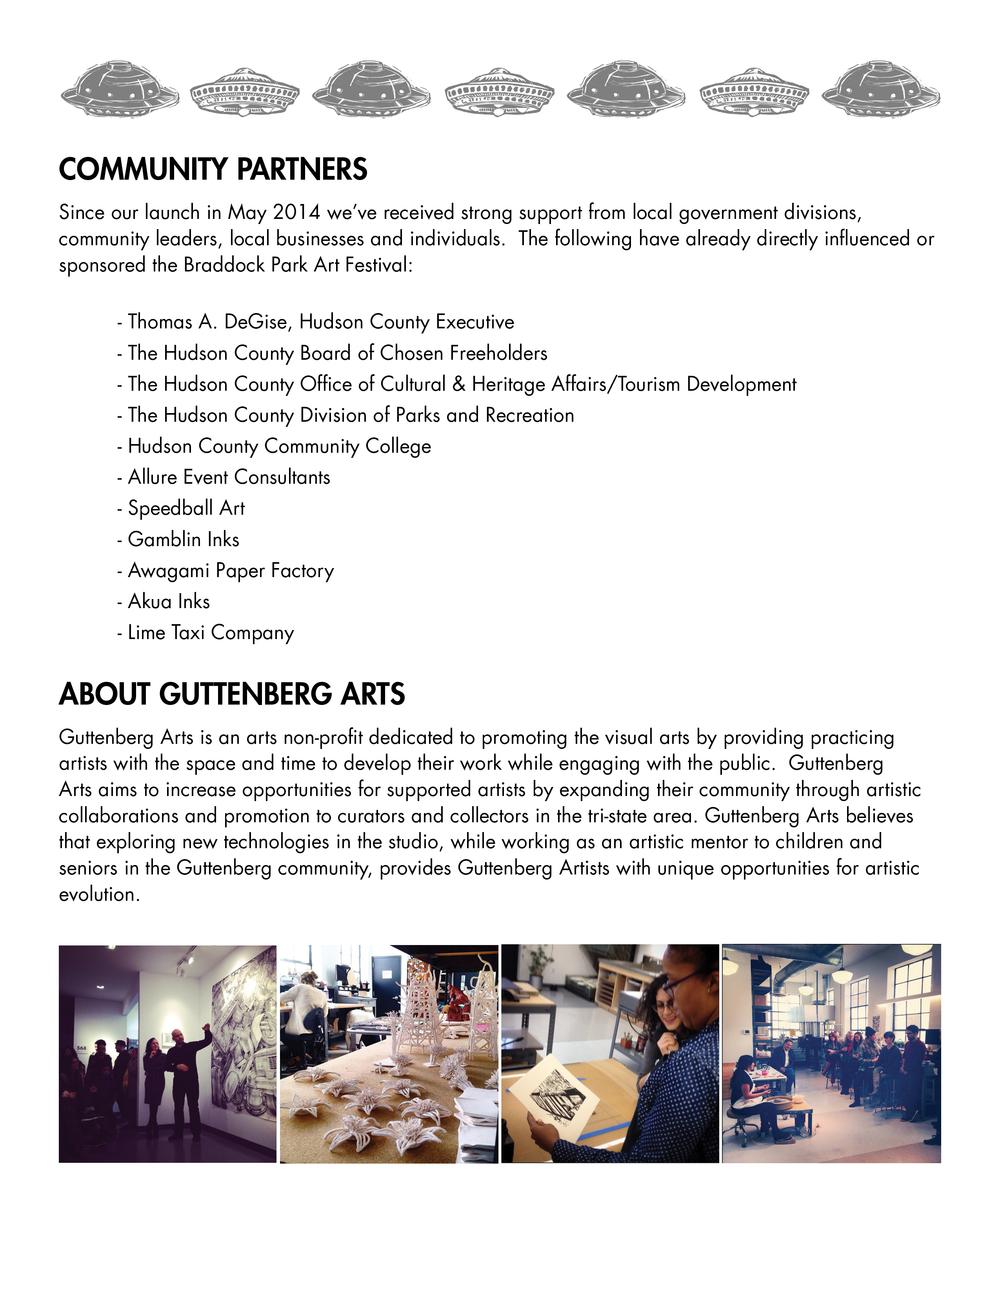 BPAF2015 Corporate Sponsorship v34.jpg